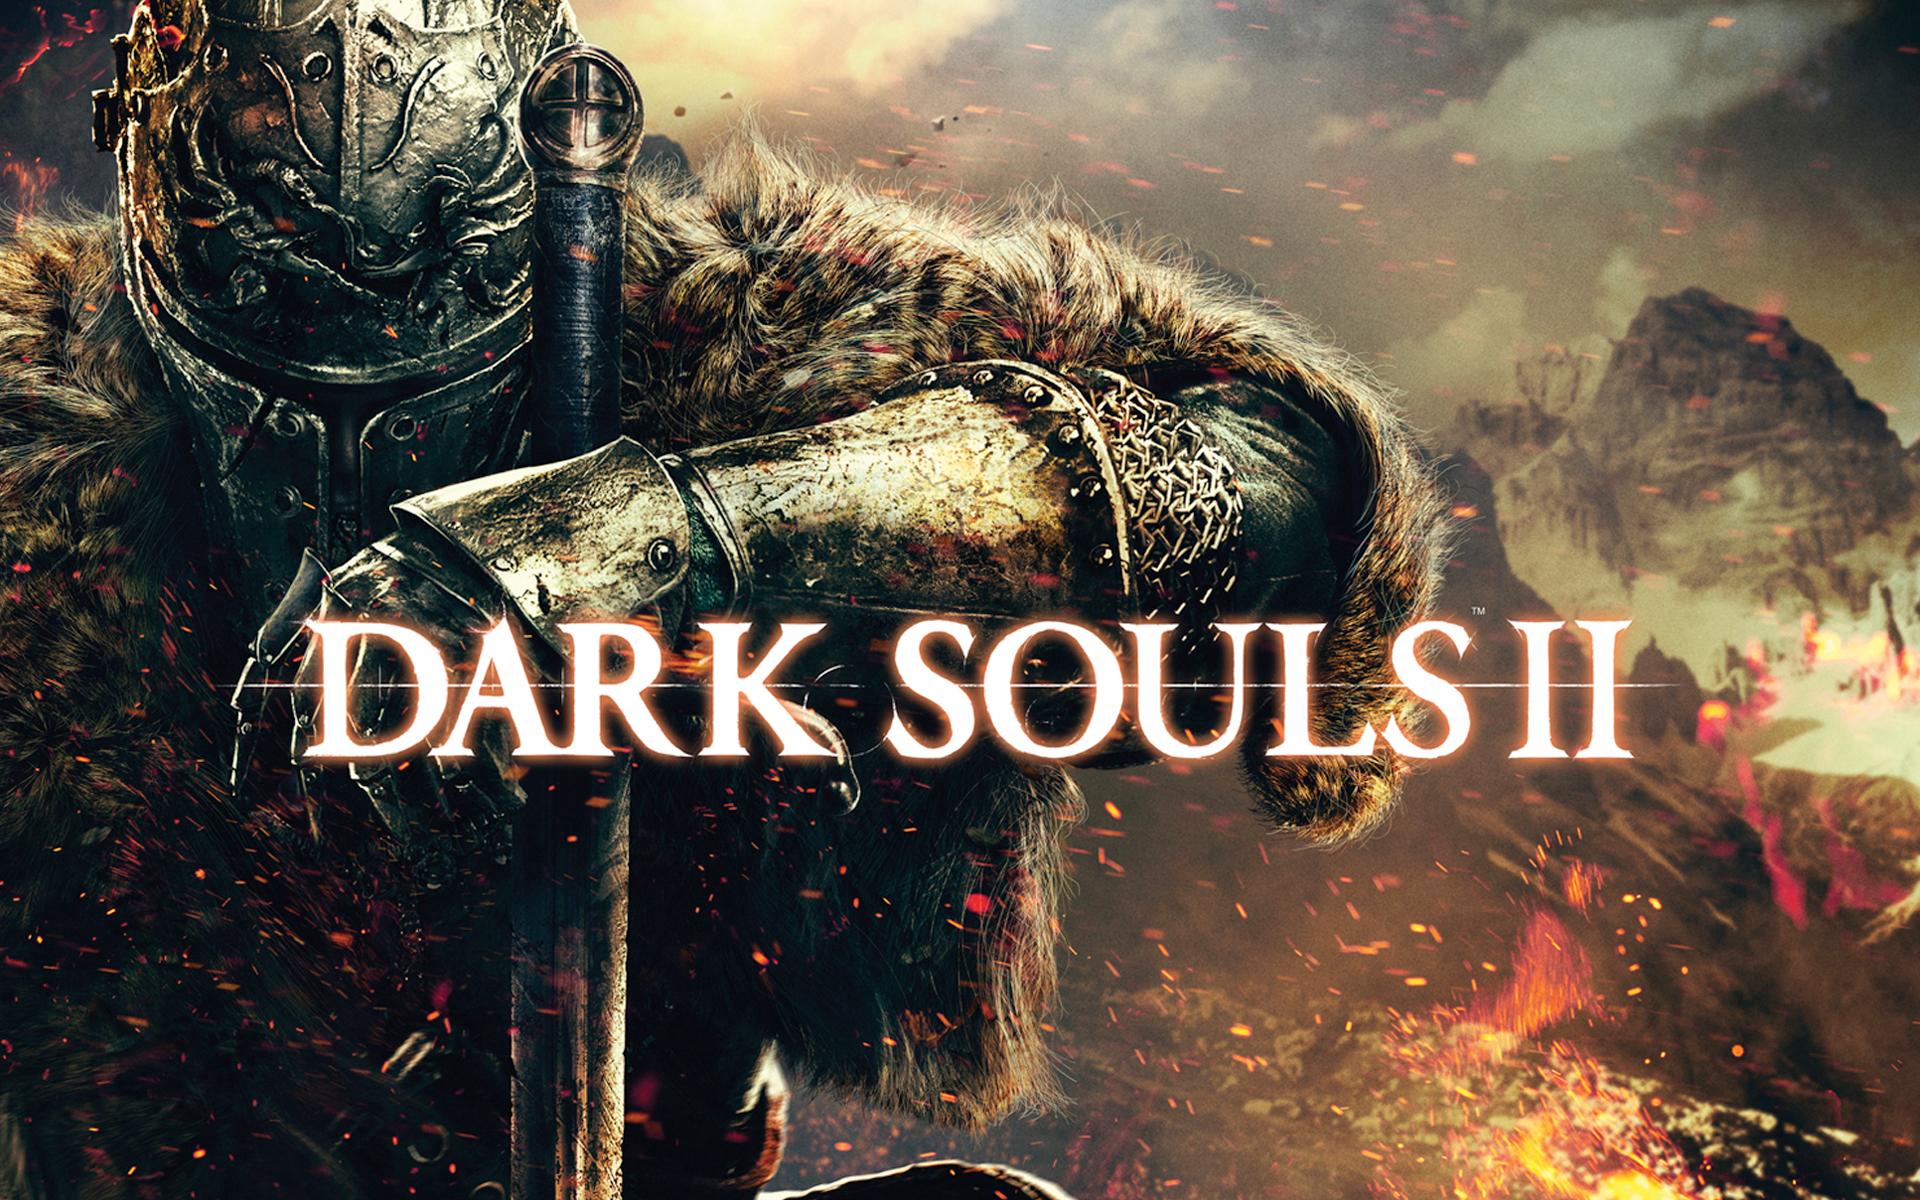 dark souls 2 video game 2o wallpaper hd